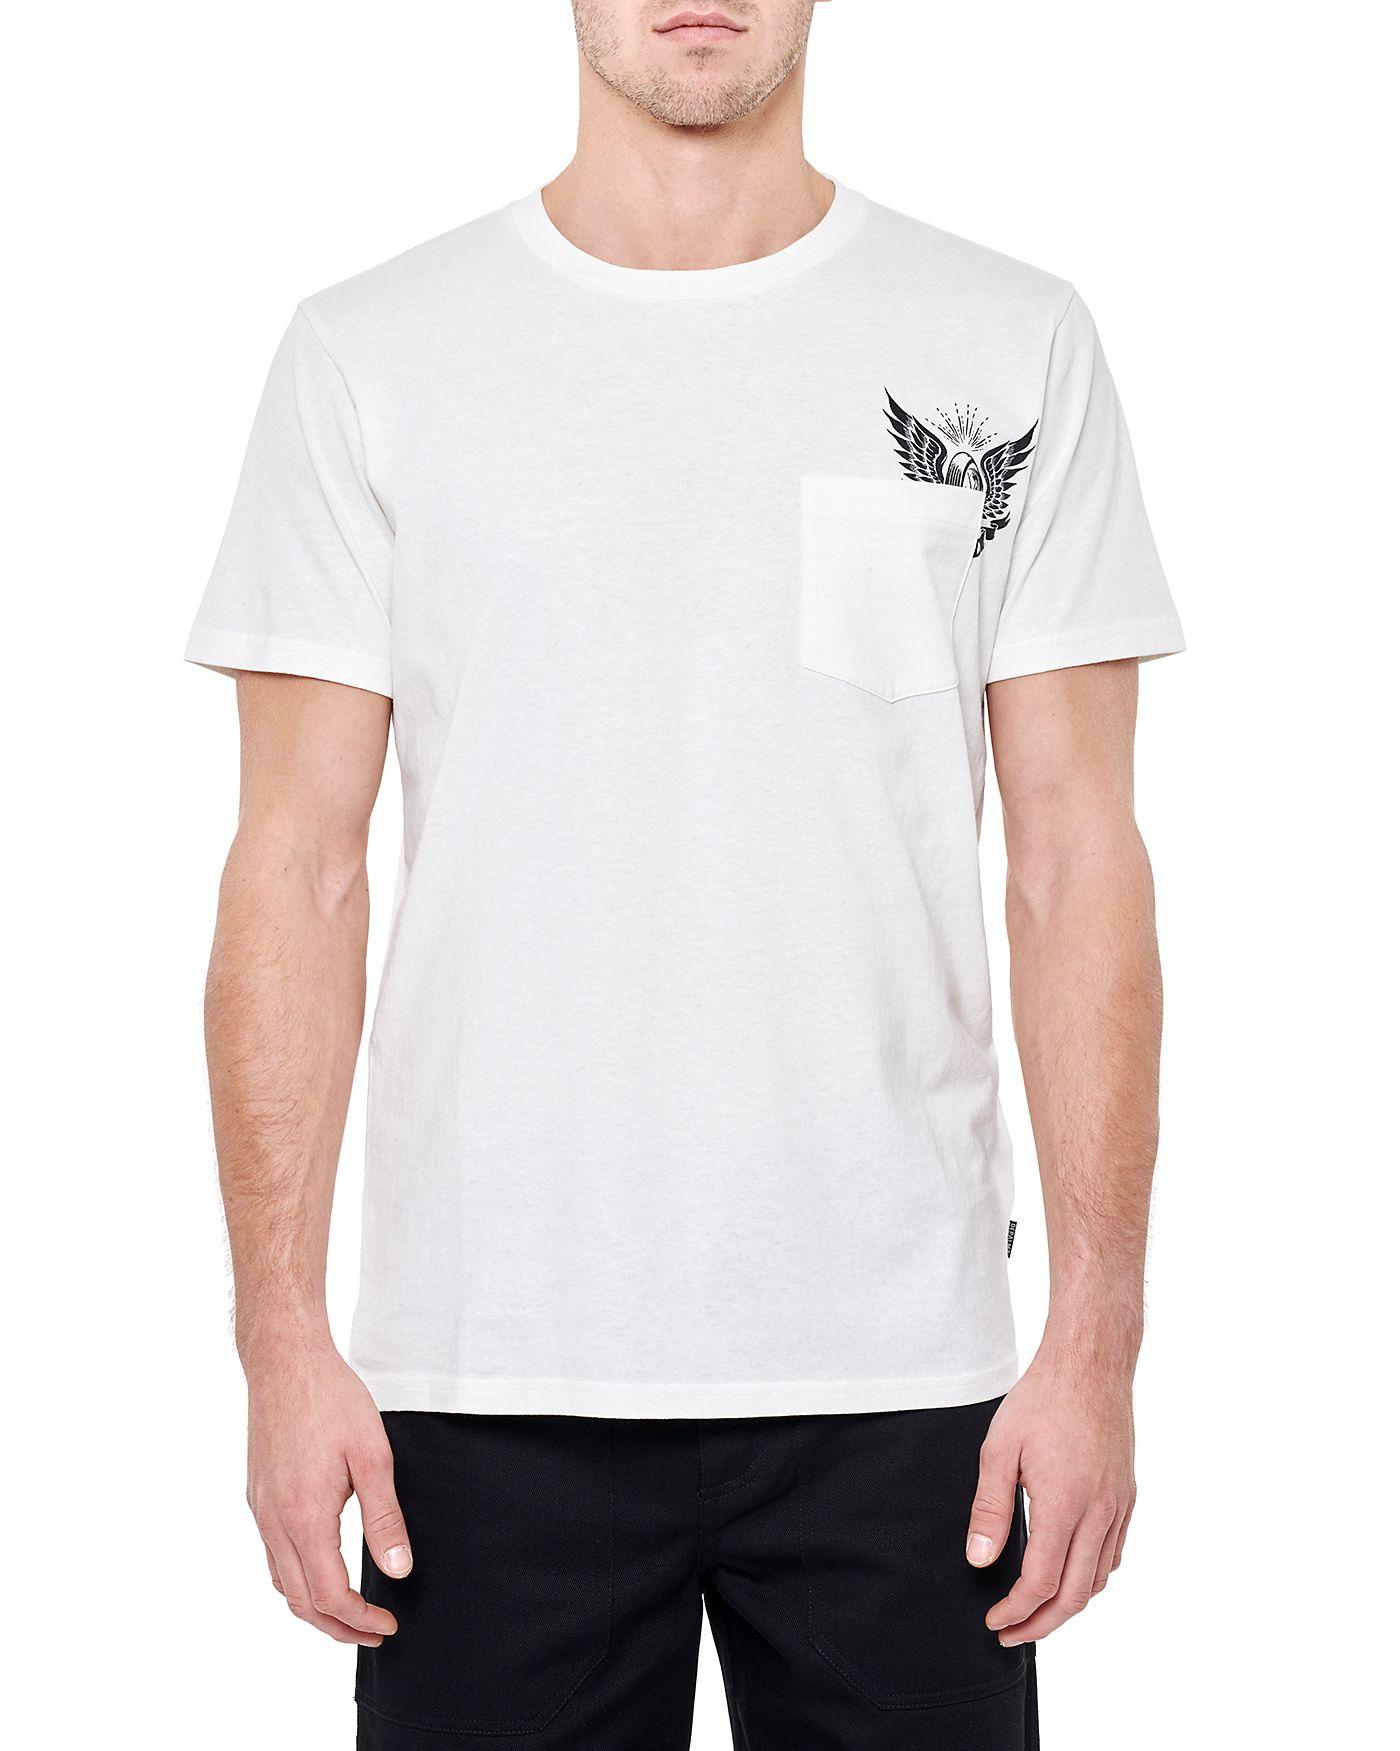 Photo of Thunder Road Pocket S/S Pocket T-shirt, White